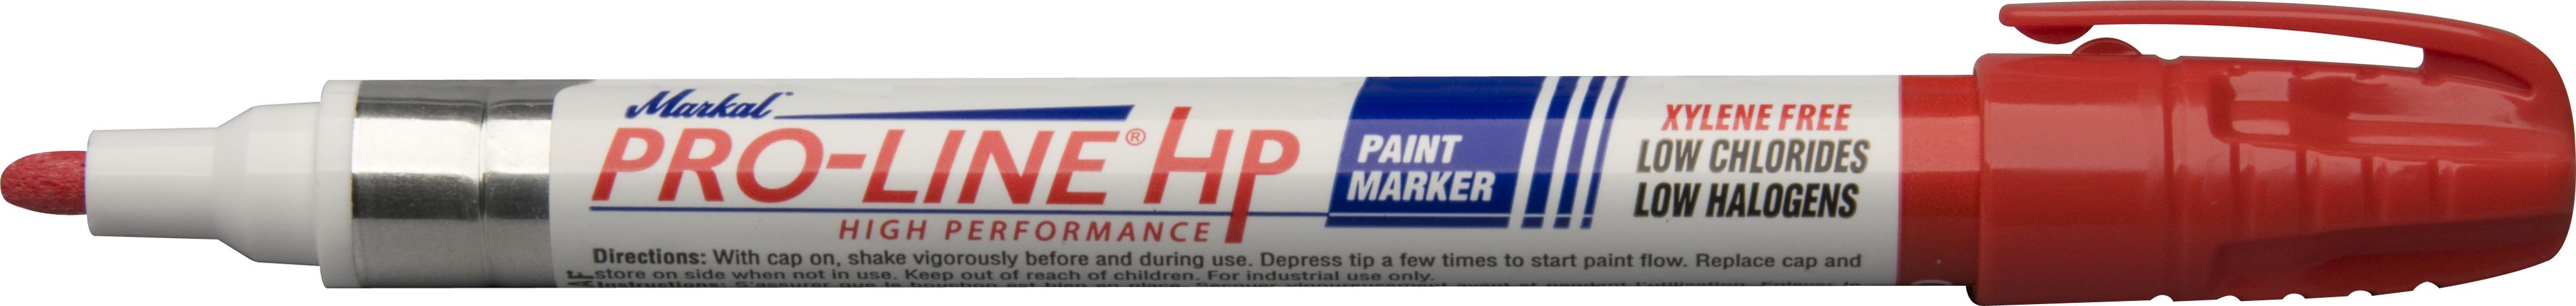 Markal Pro Line HP Paint Marker - Light Green